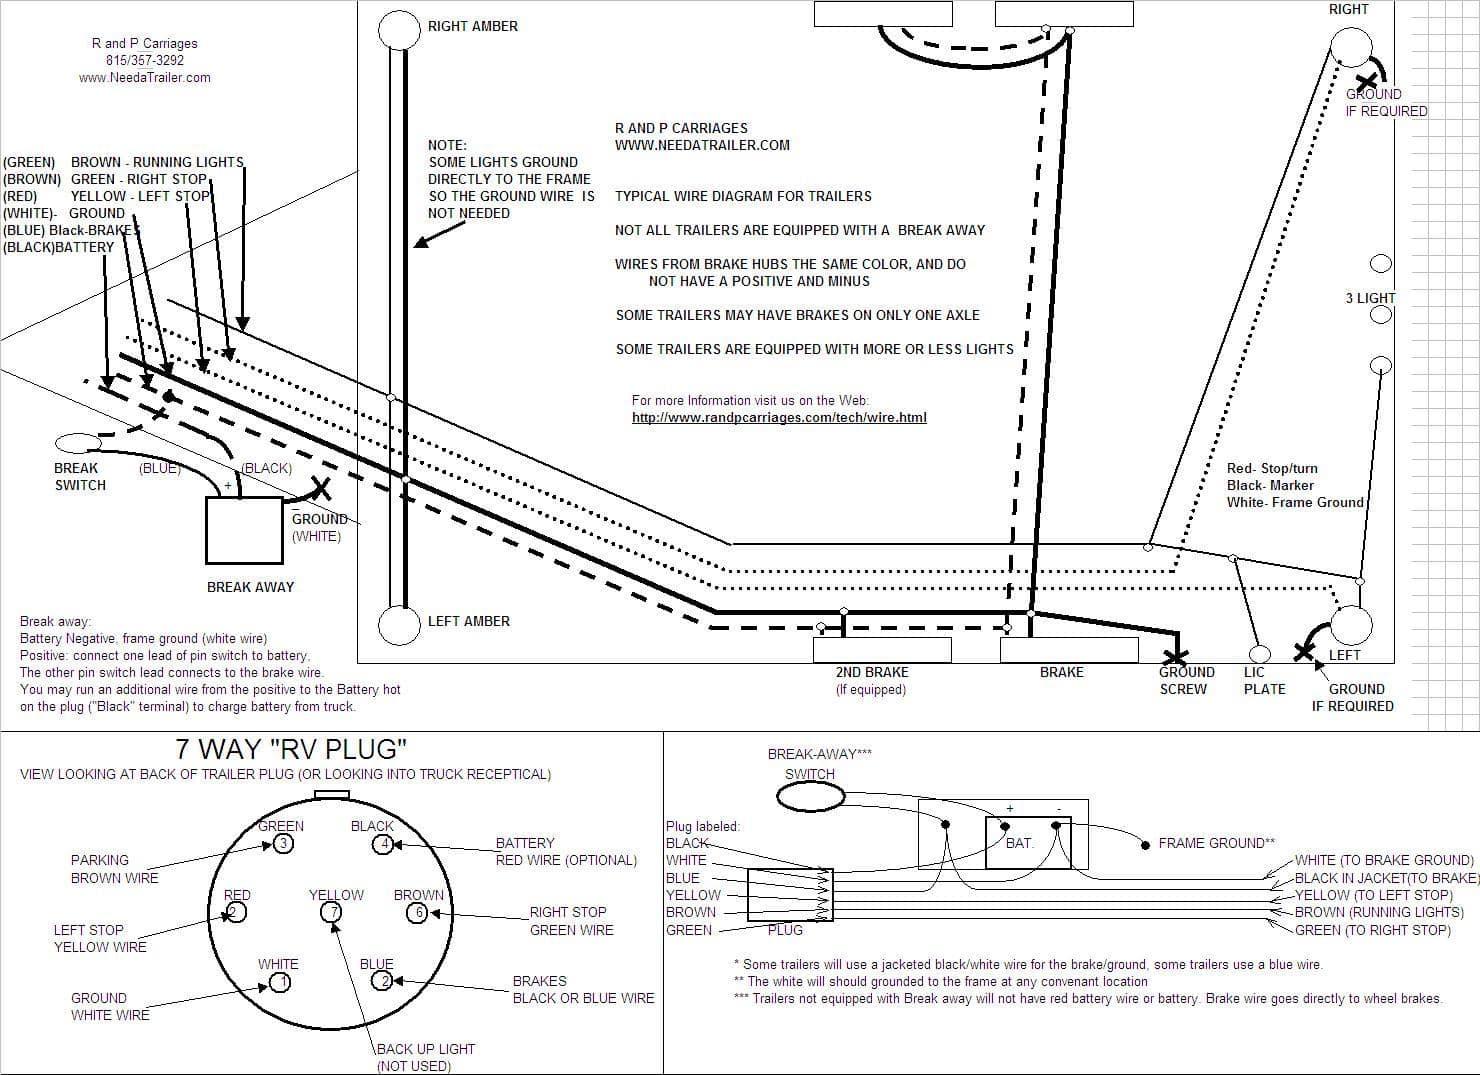 7 Way Plug Information | R And P Carriages | Cargo, Utility, Dump - 7 Way Trailer Plug Wiring Diagram